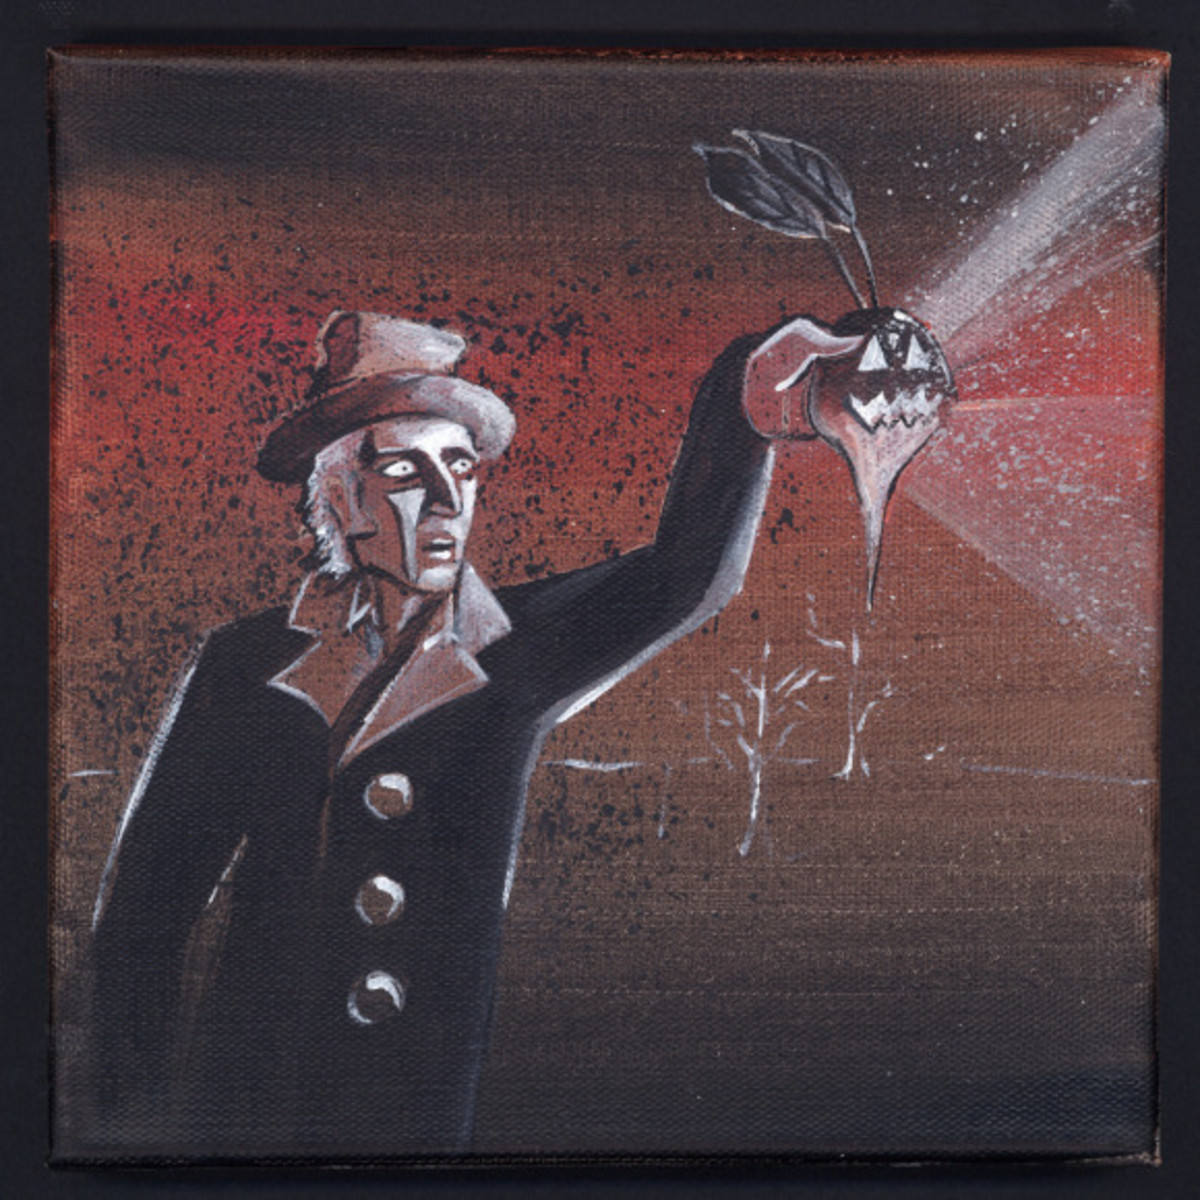 Stingy Jack by Devon Devereaux